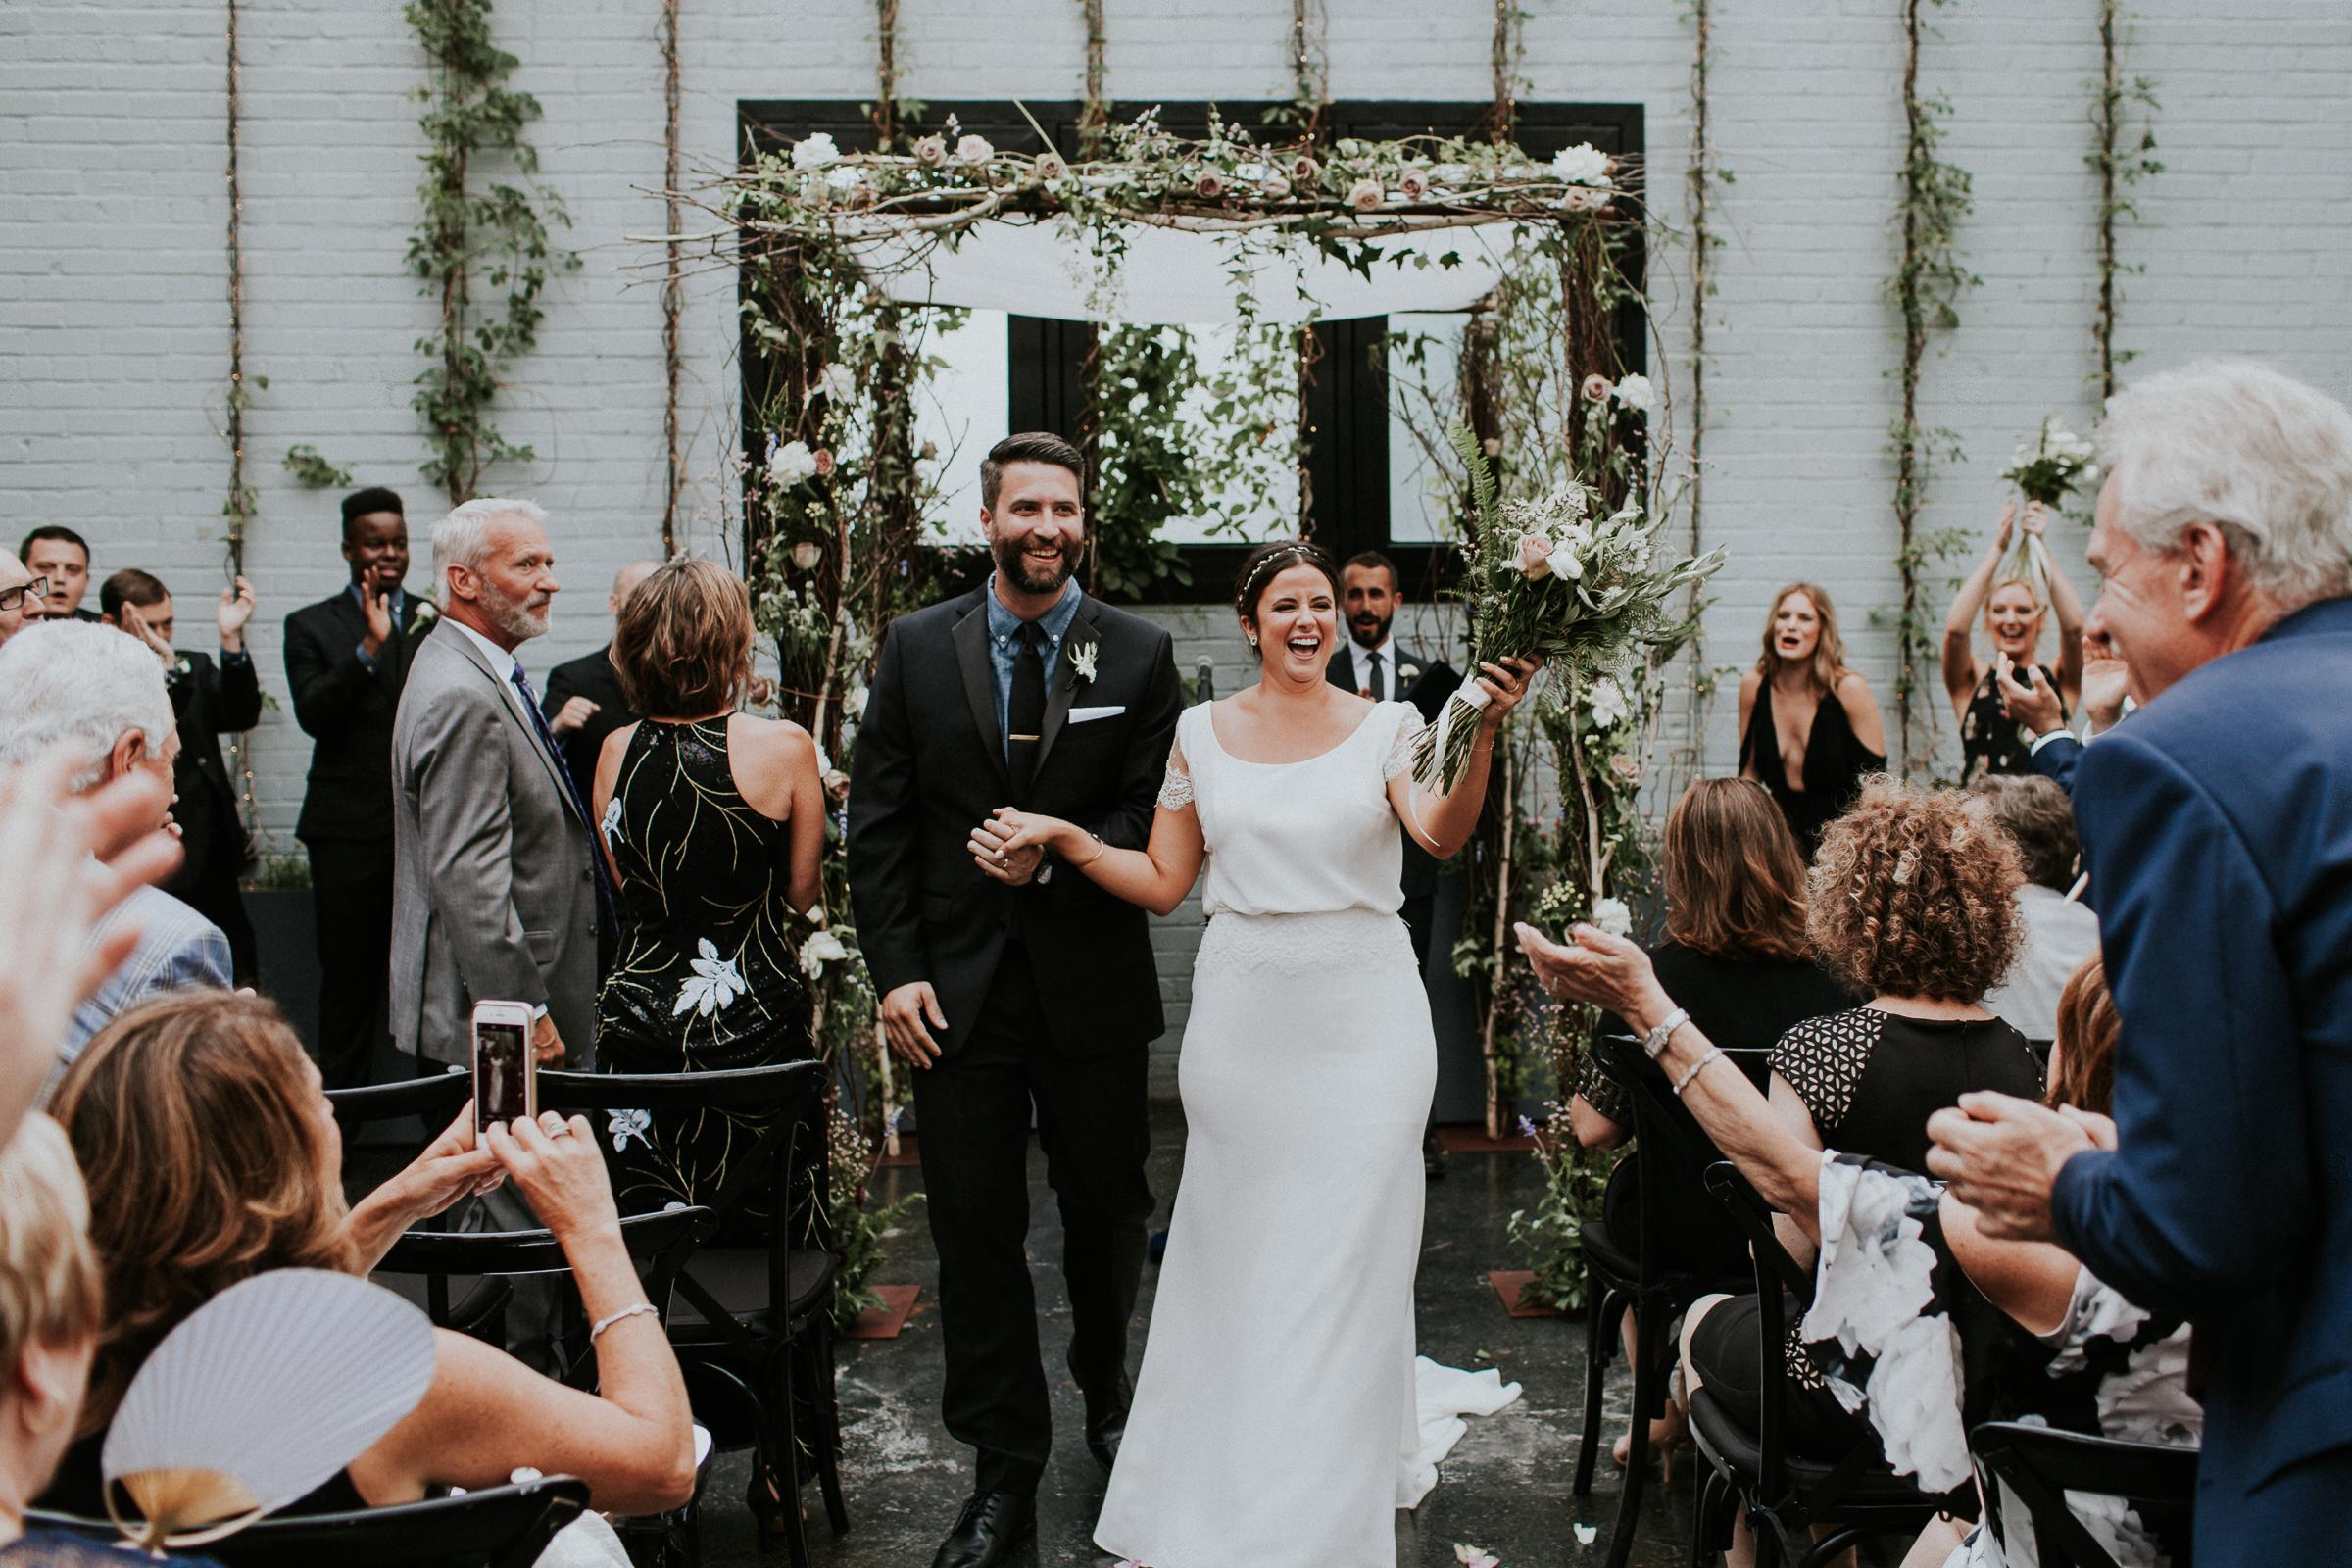 New-York-Documentary-Wedding-Photography-Best-Of-2017-by-Elvira-Kalviste-Photography-7.jpg